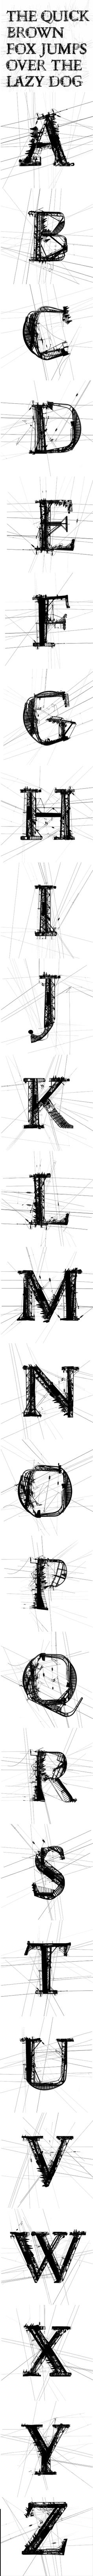 Garamond Powerline is a new typeface by Daniel Adolph Creative Typography, Typography Design, Simple Fonts, Design Art, Logo Design, Meraki, Typography Inspiration, Printmaking, Art Deco